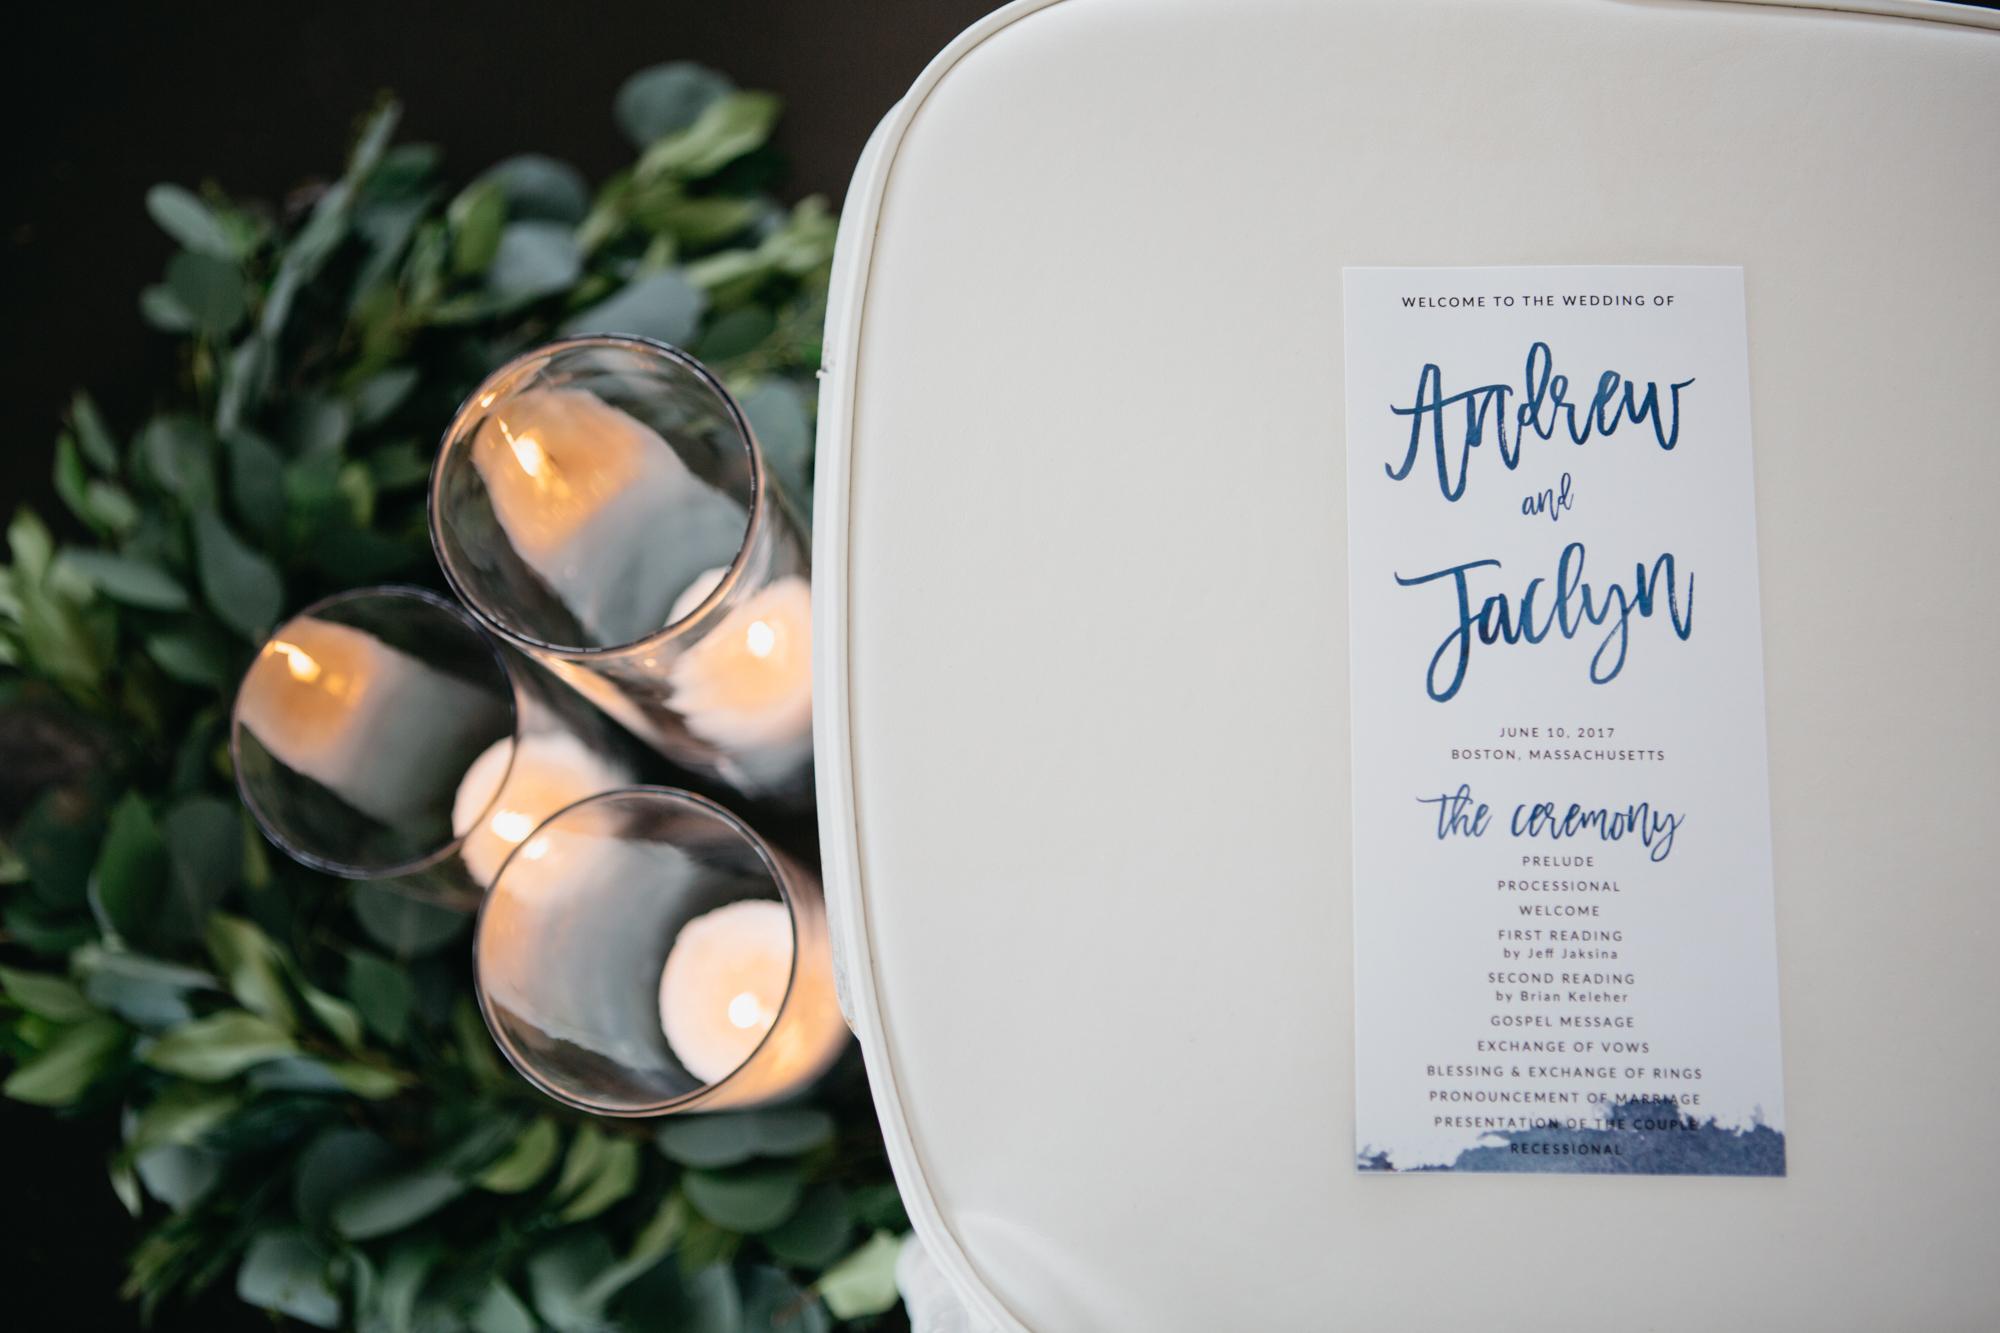 Jaclyn_Andrew_quincy_massachusetts_wedding011.jpg